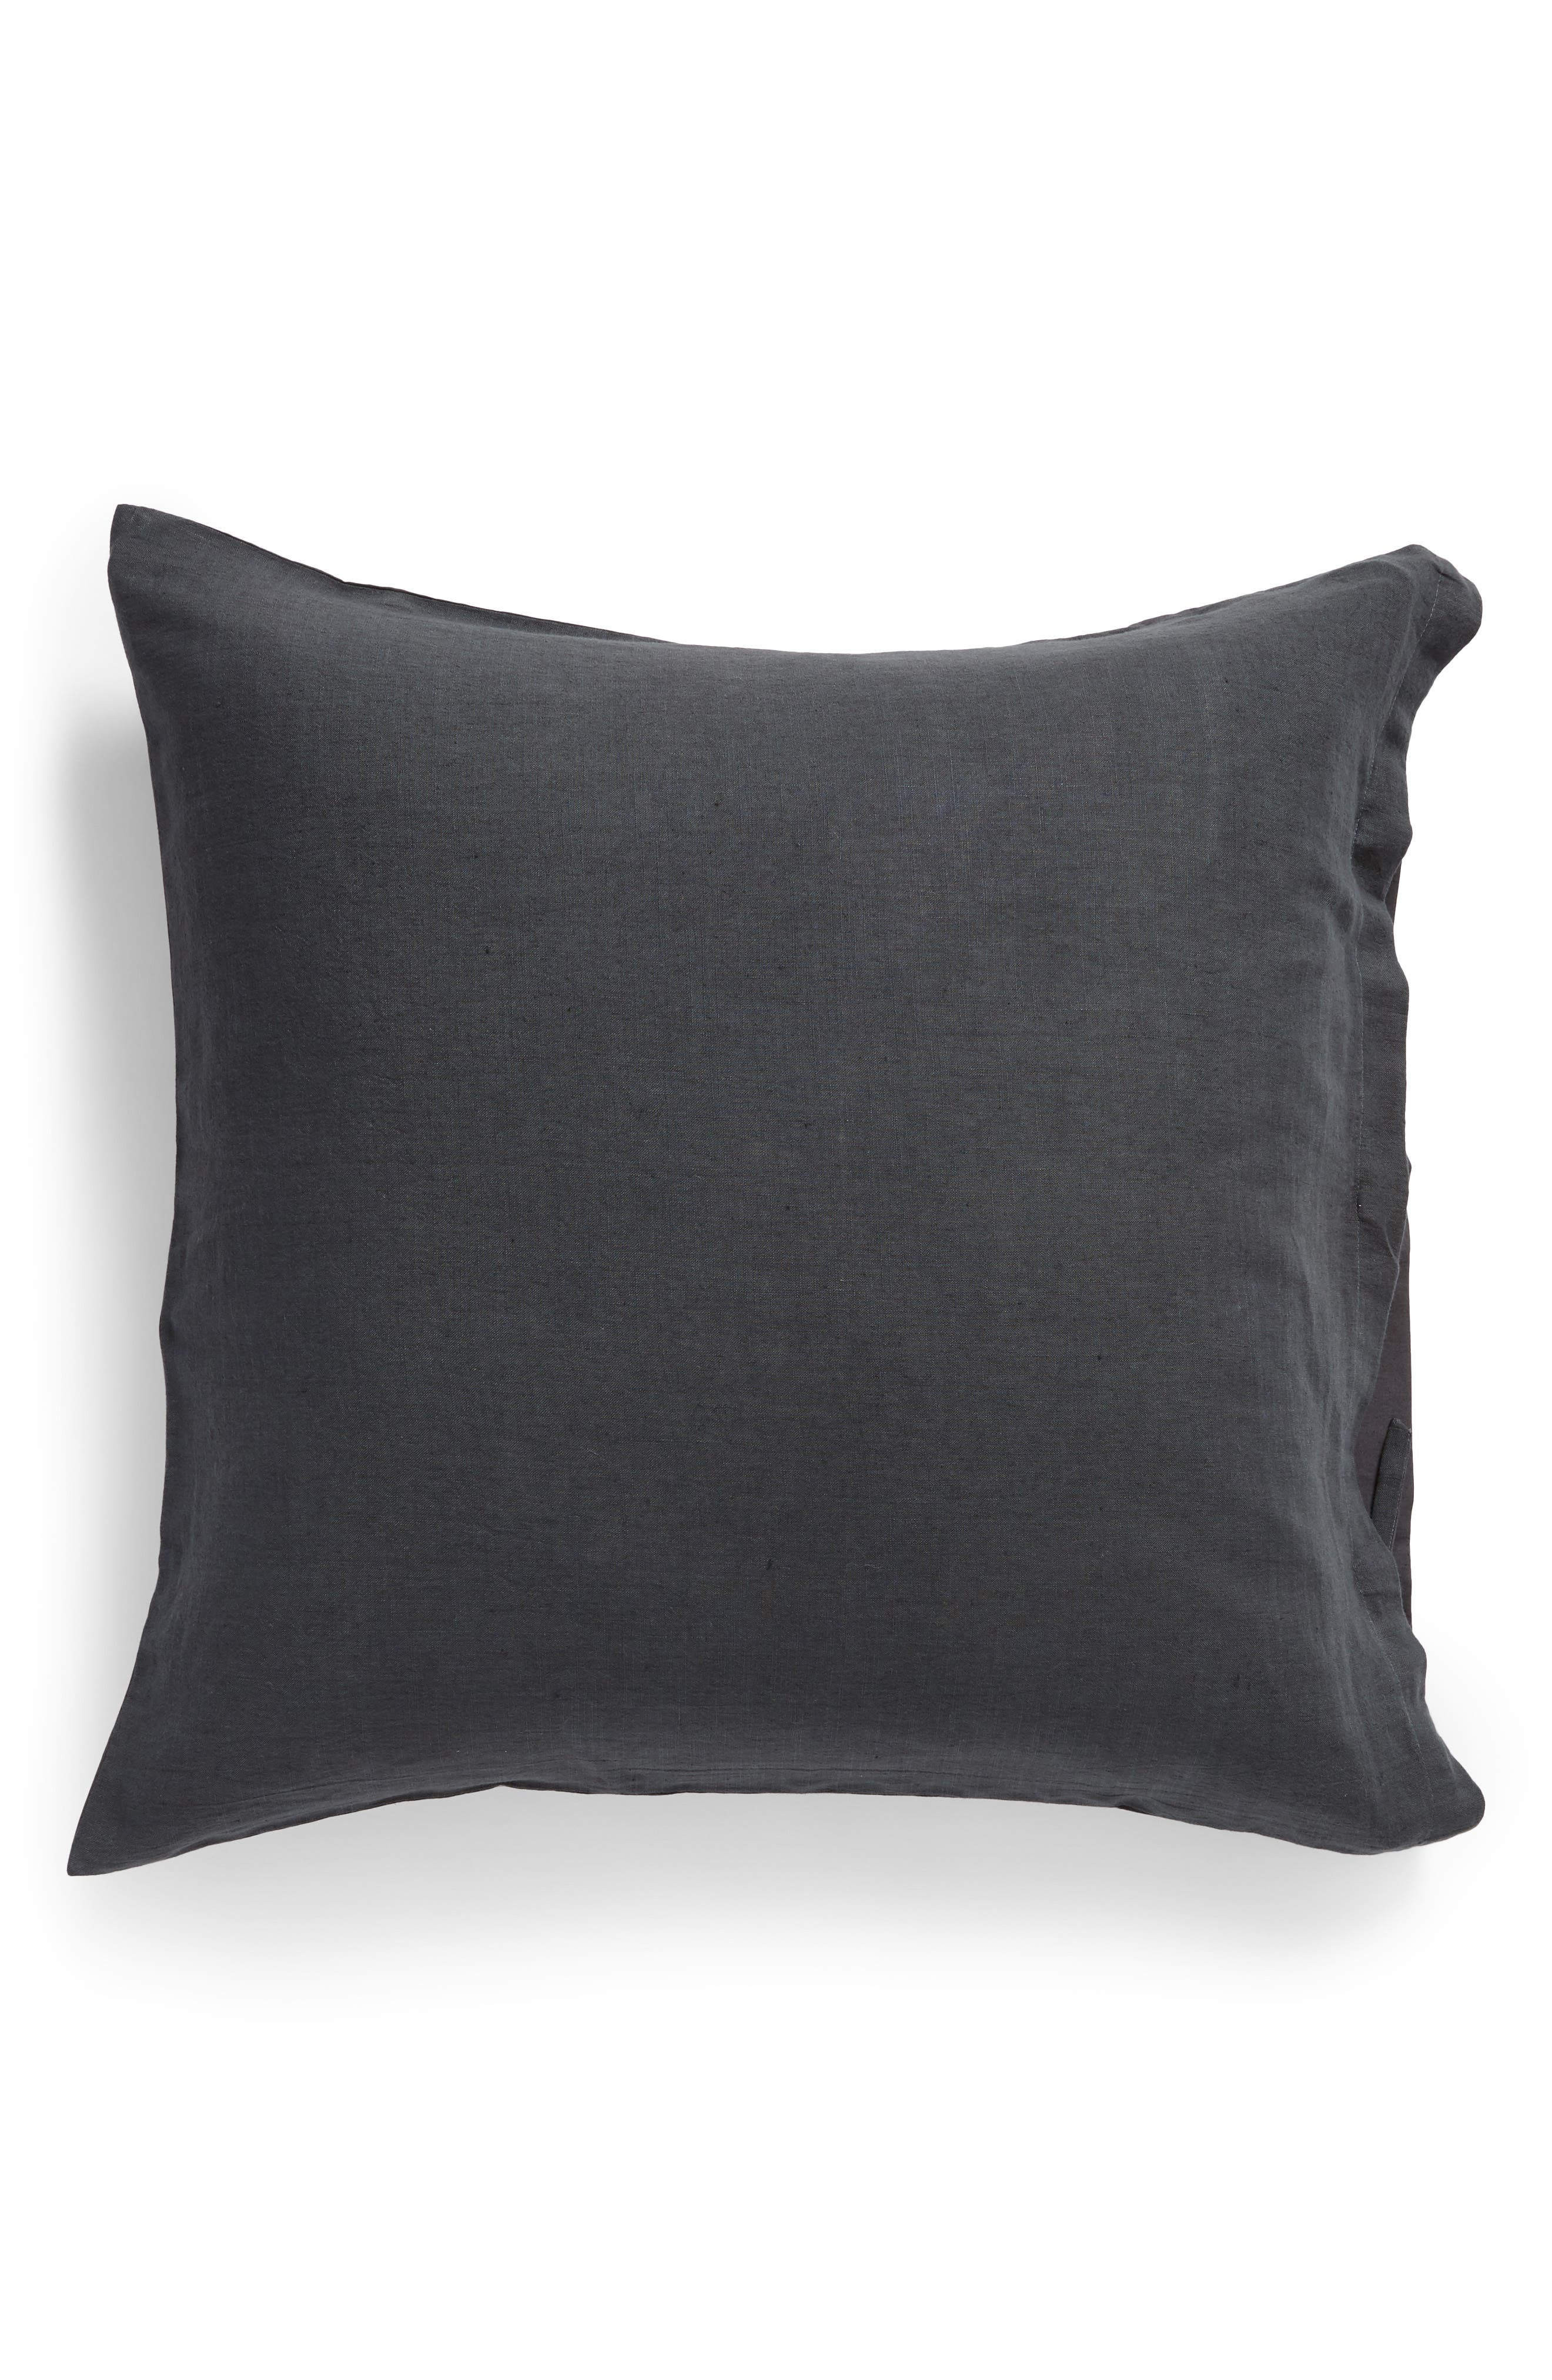 TREASURE & BOND Relaxed Cotton & Linen Euro Sham, Main, color, GREY ONYX